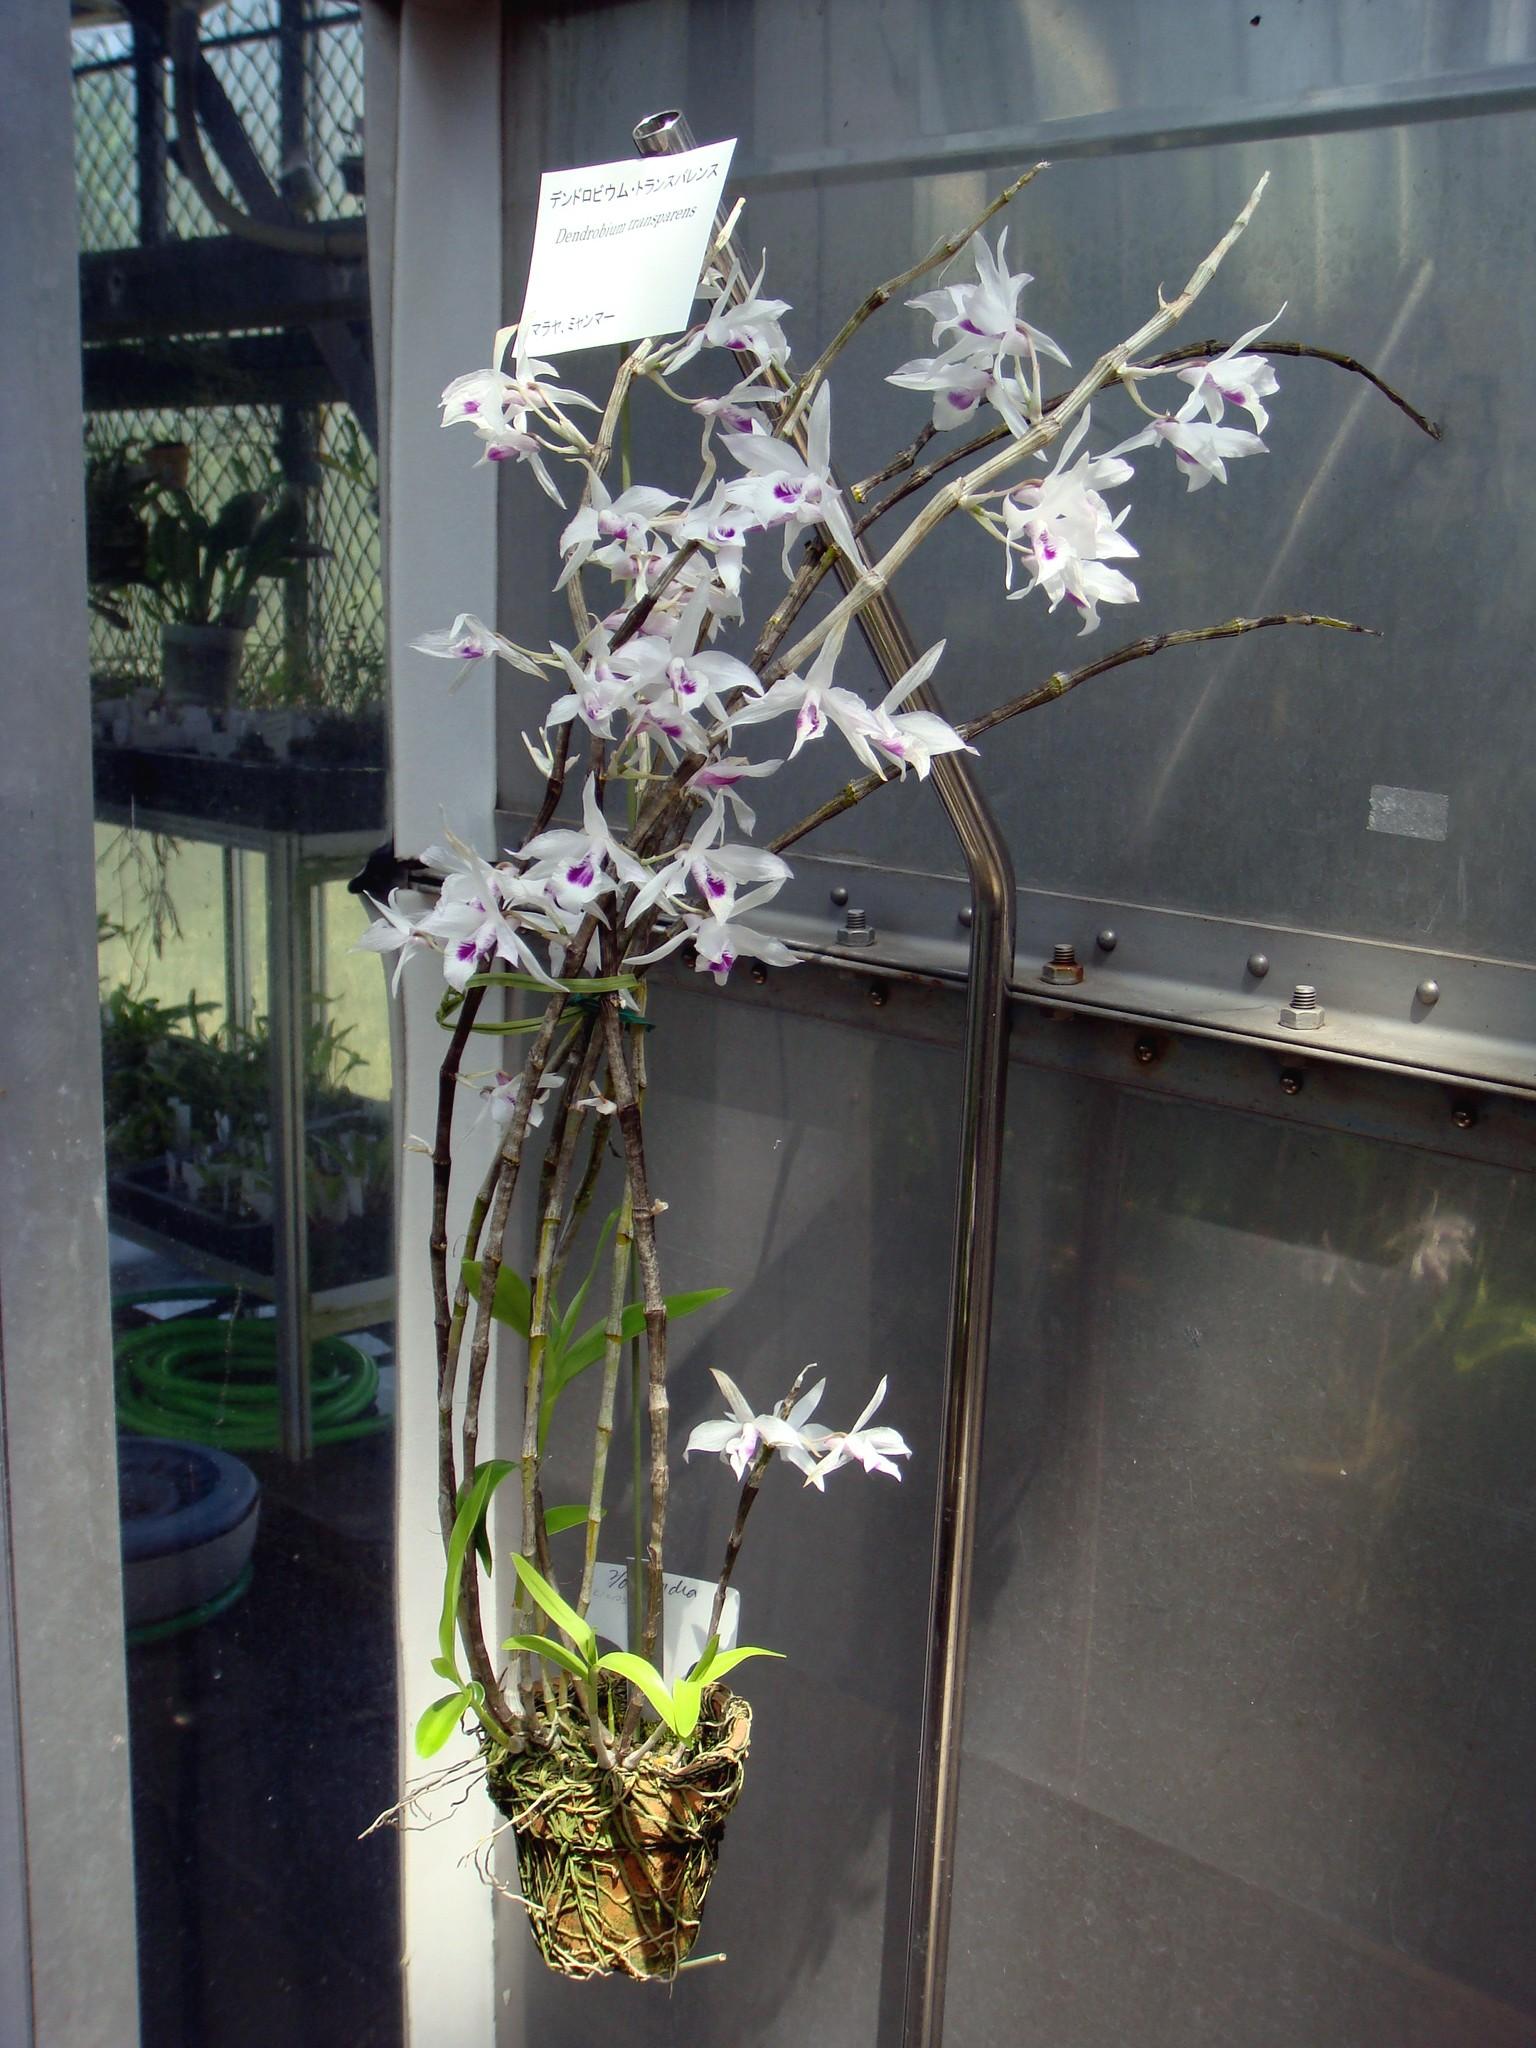 http://orchids.la.coocan.jp/Dendrobium/Dendrobium%20transparens/DSC04763.JPG